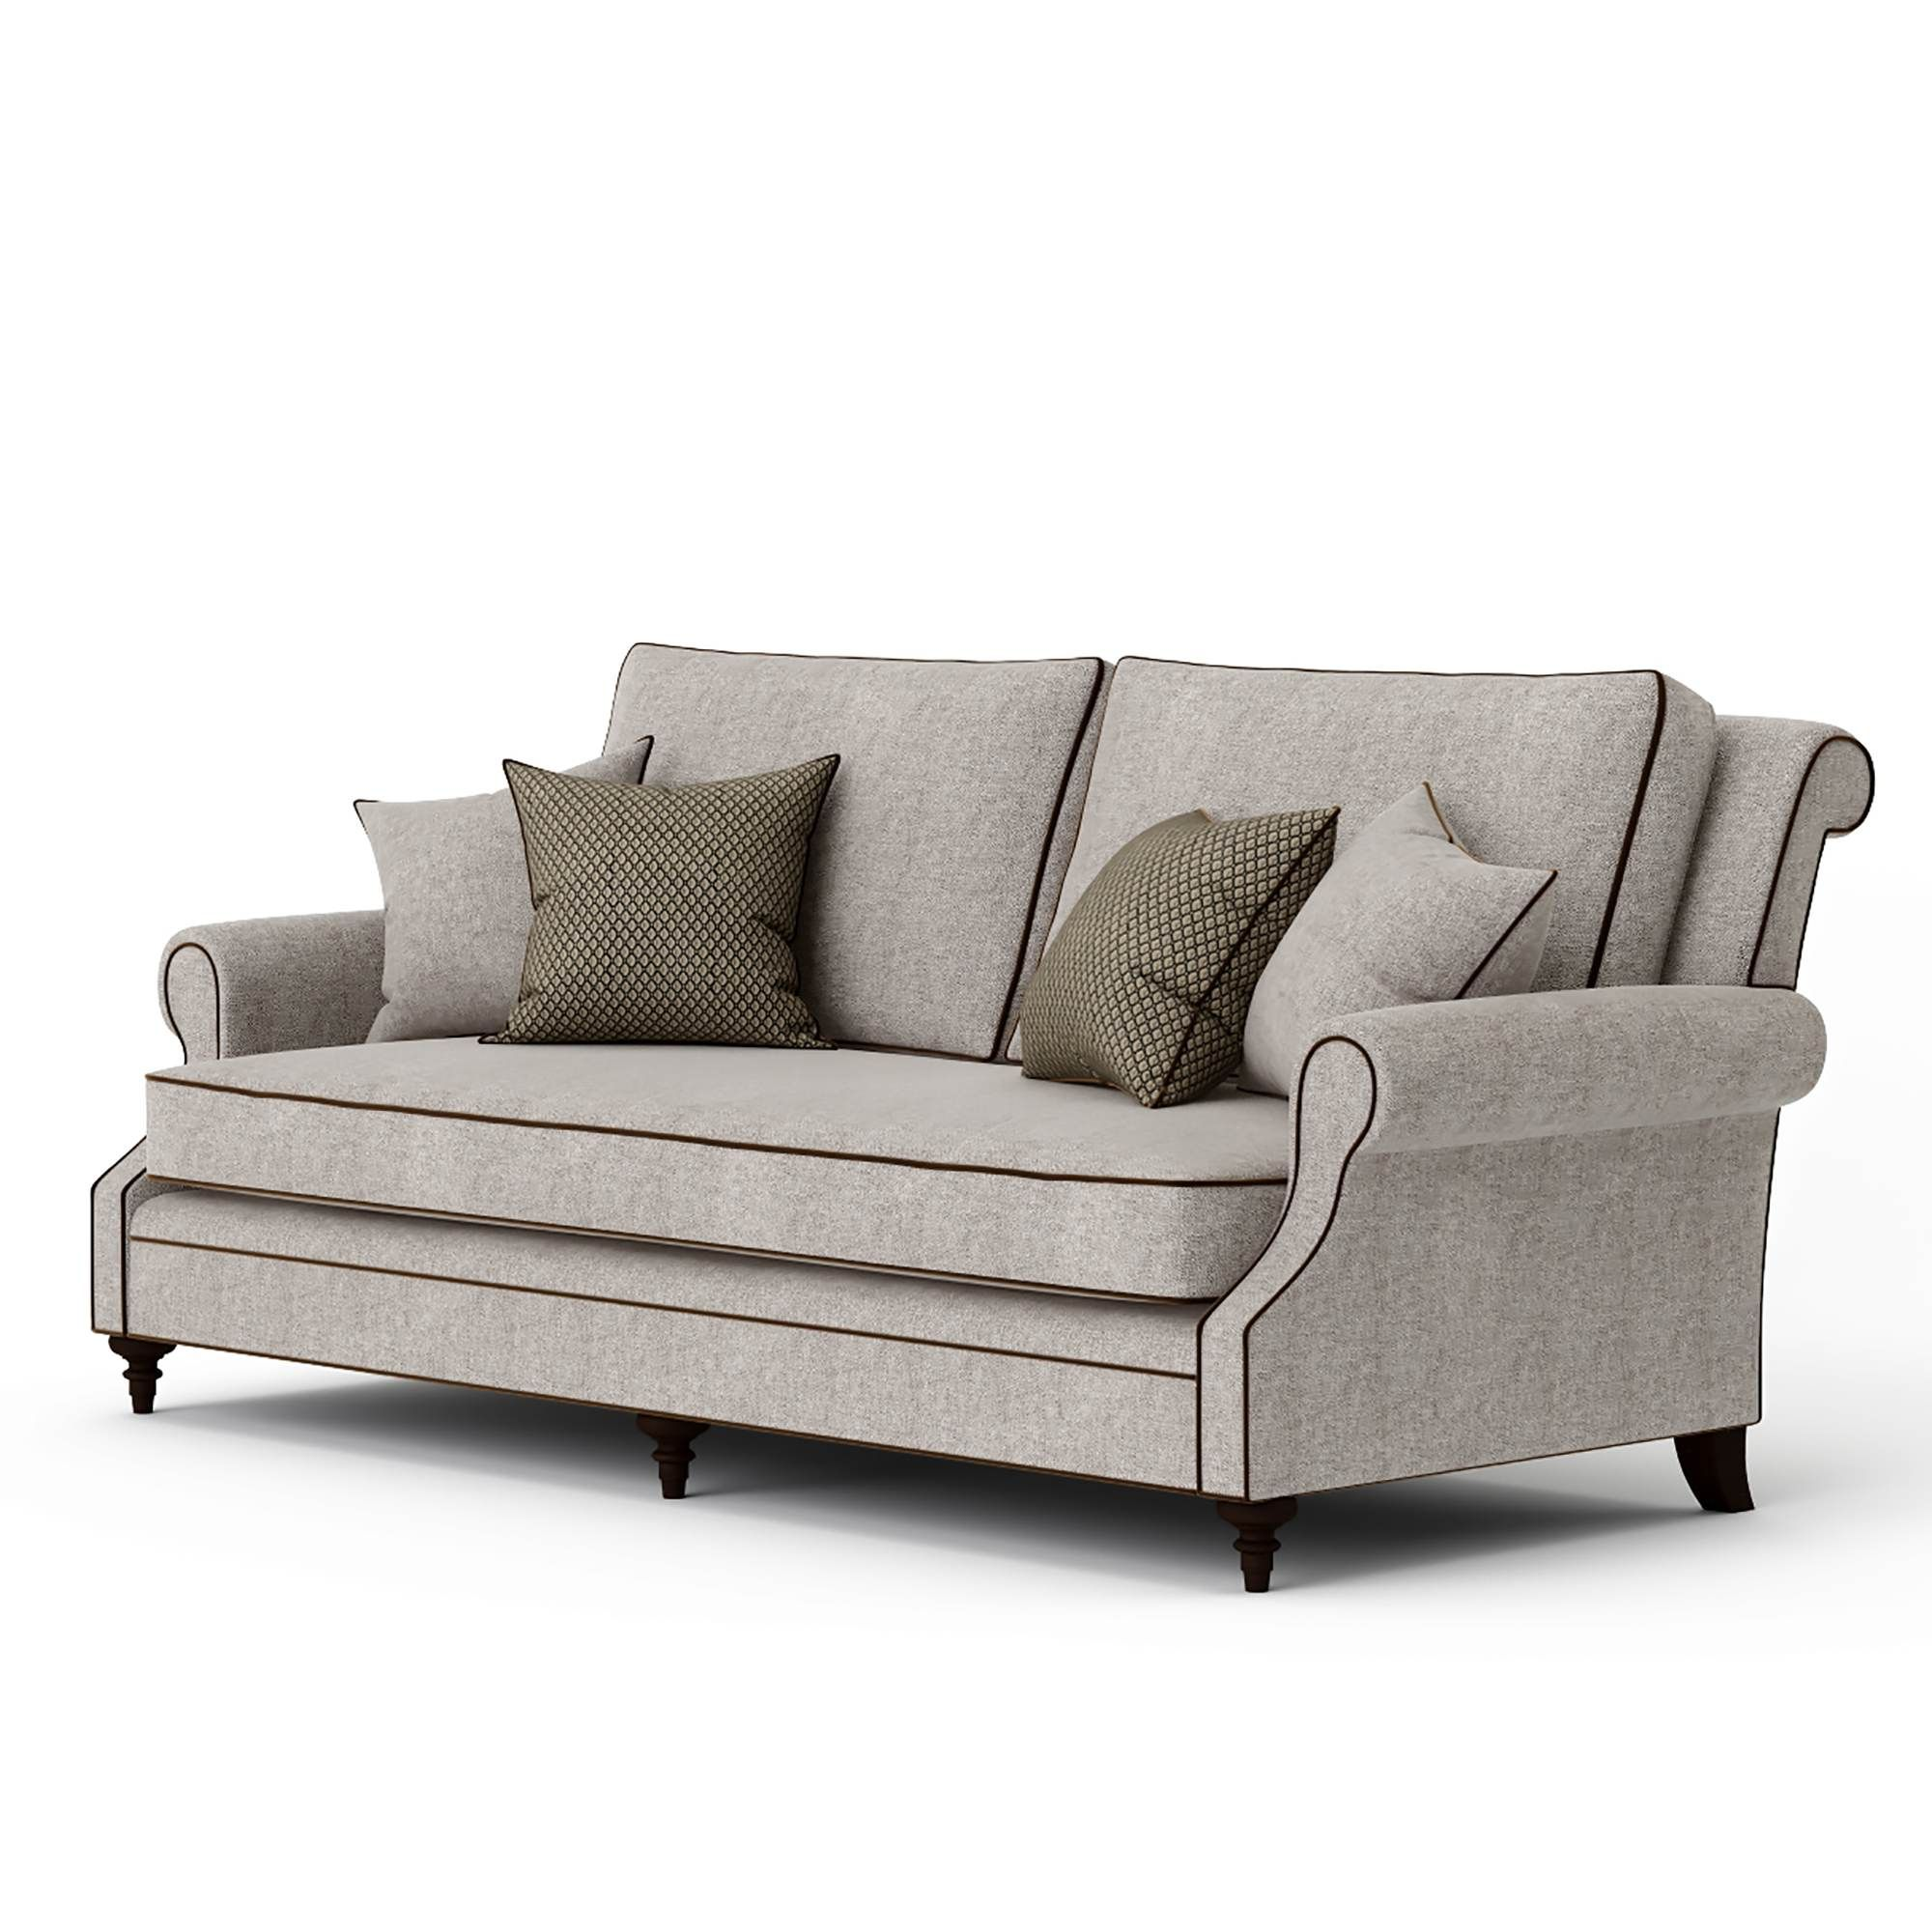 3d Model Sofa 16 Free Download Couch Design Sofa Royal Furniture